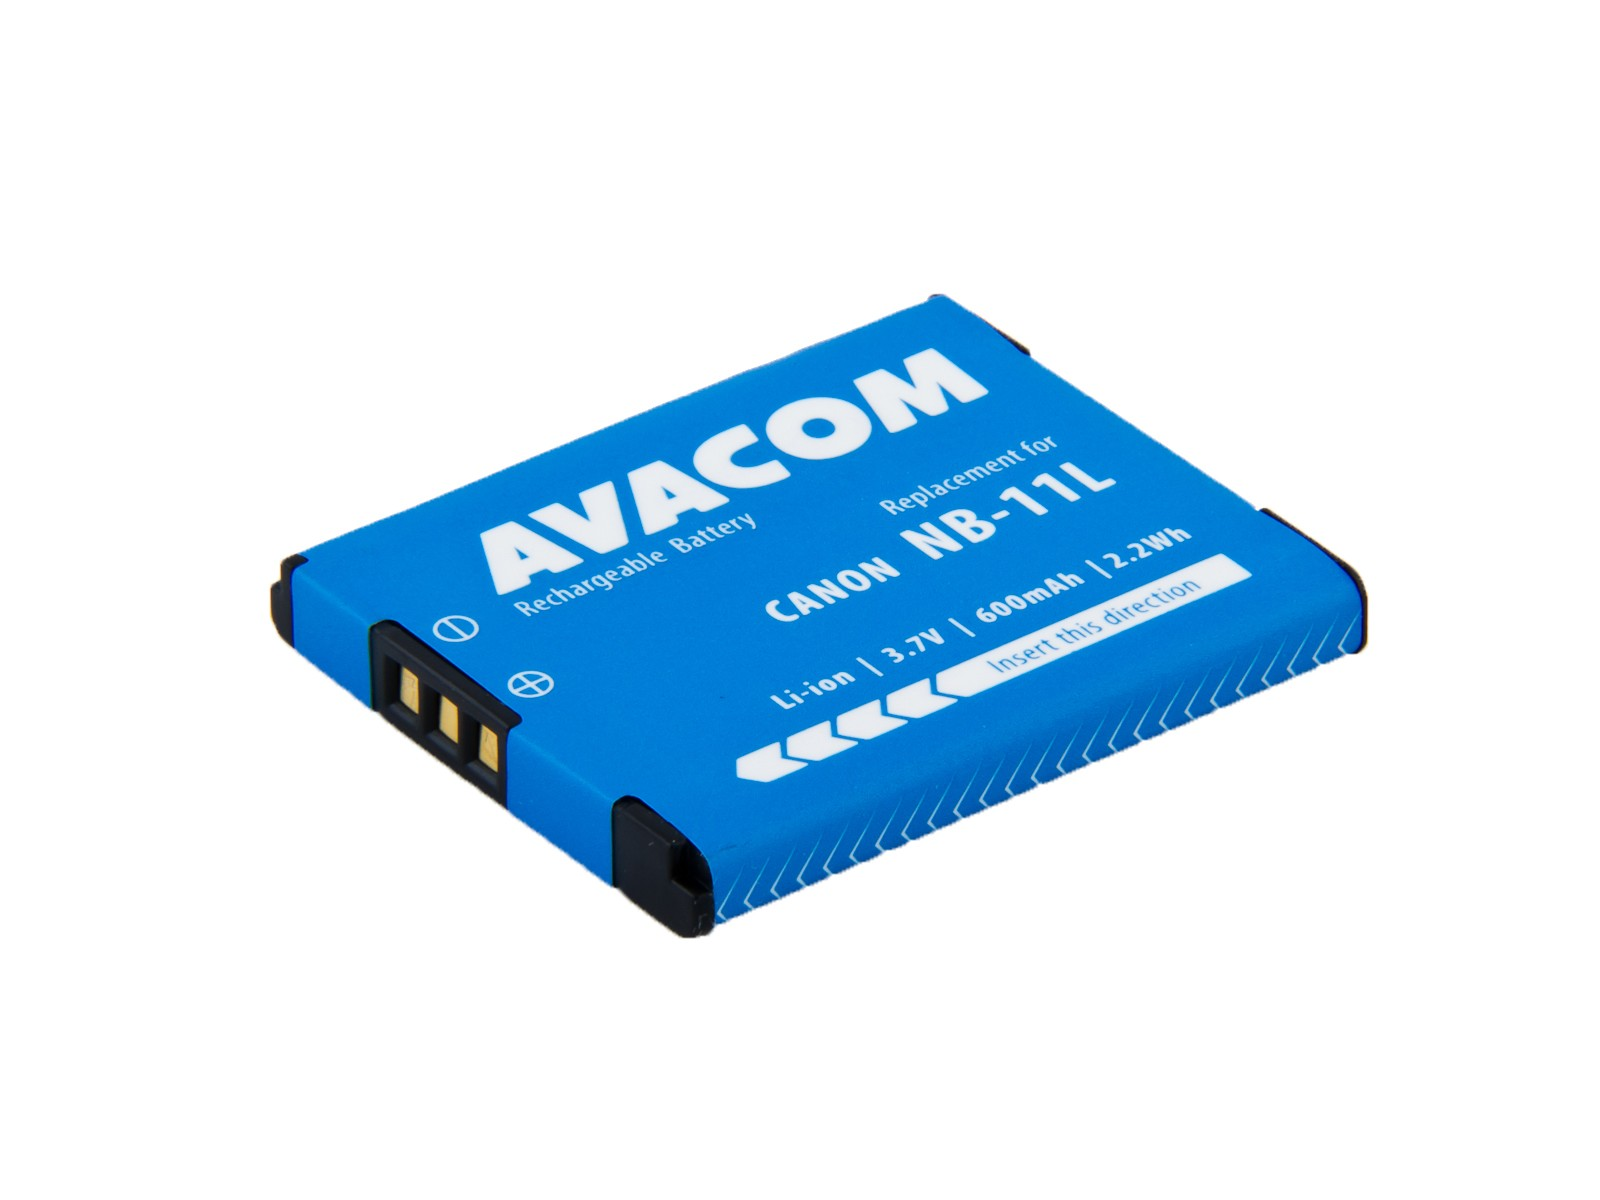 Náhradní baterie AVACOM Canon NB-11L Li-ion 3.7V 600mAh 2.2Wh